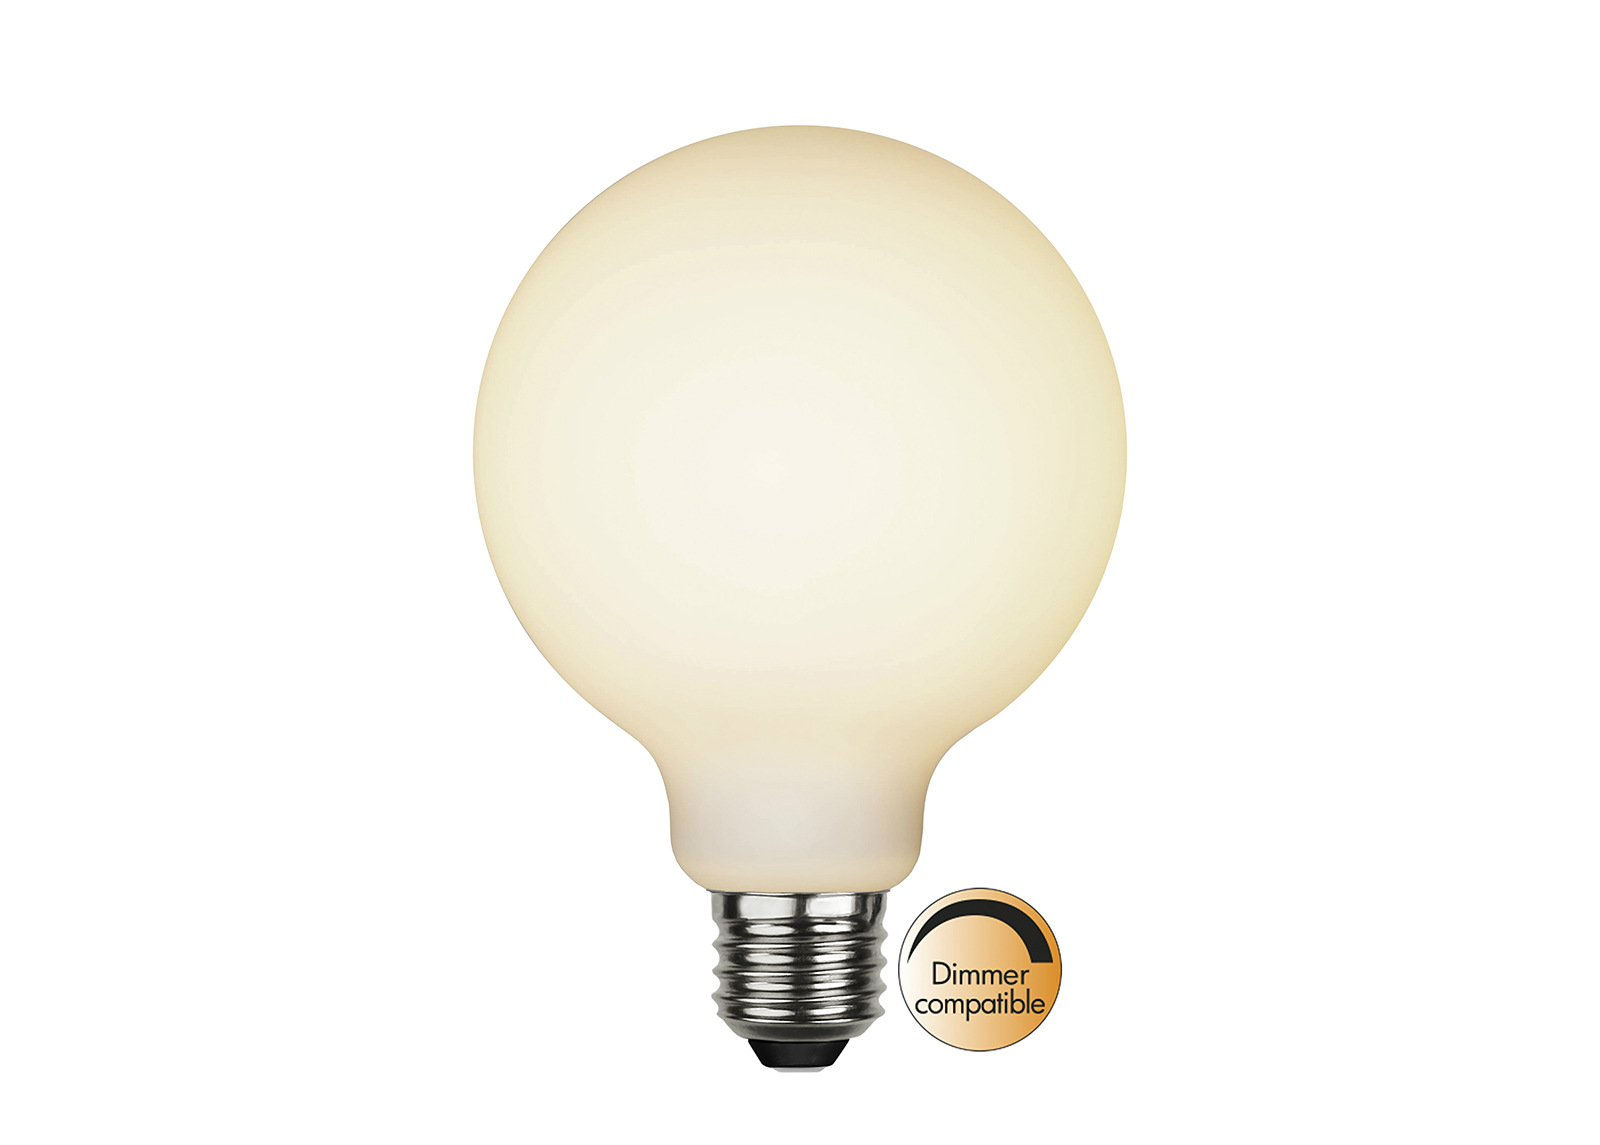 LED sähkölamppu E27 5 W